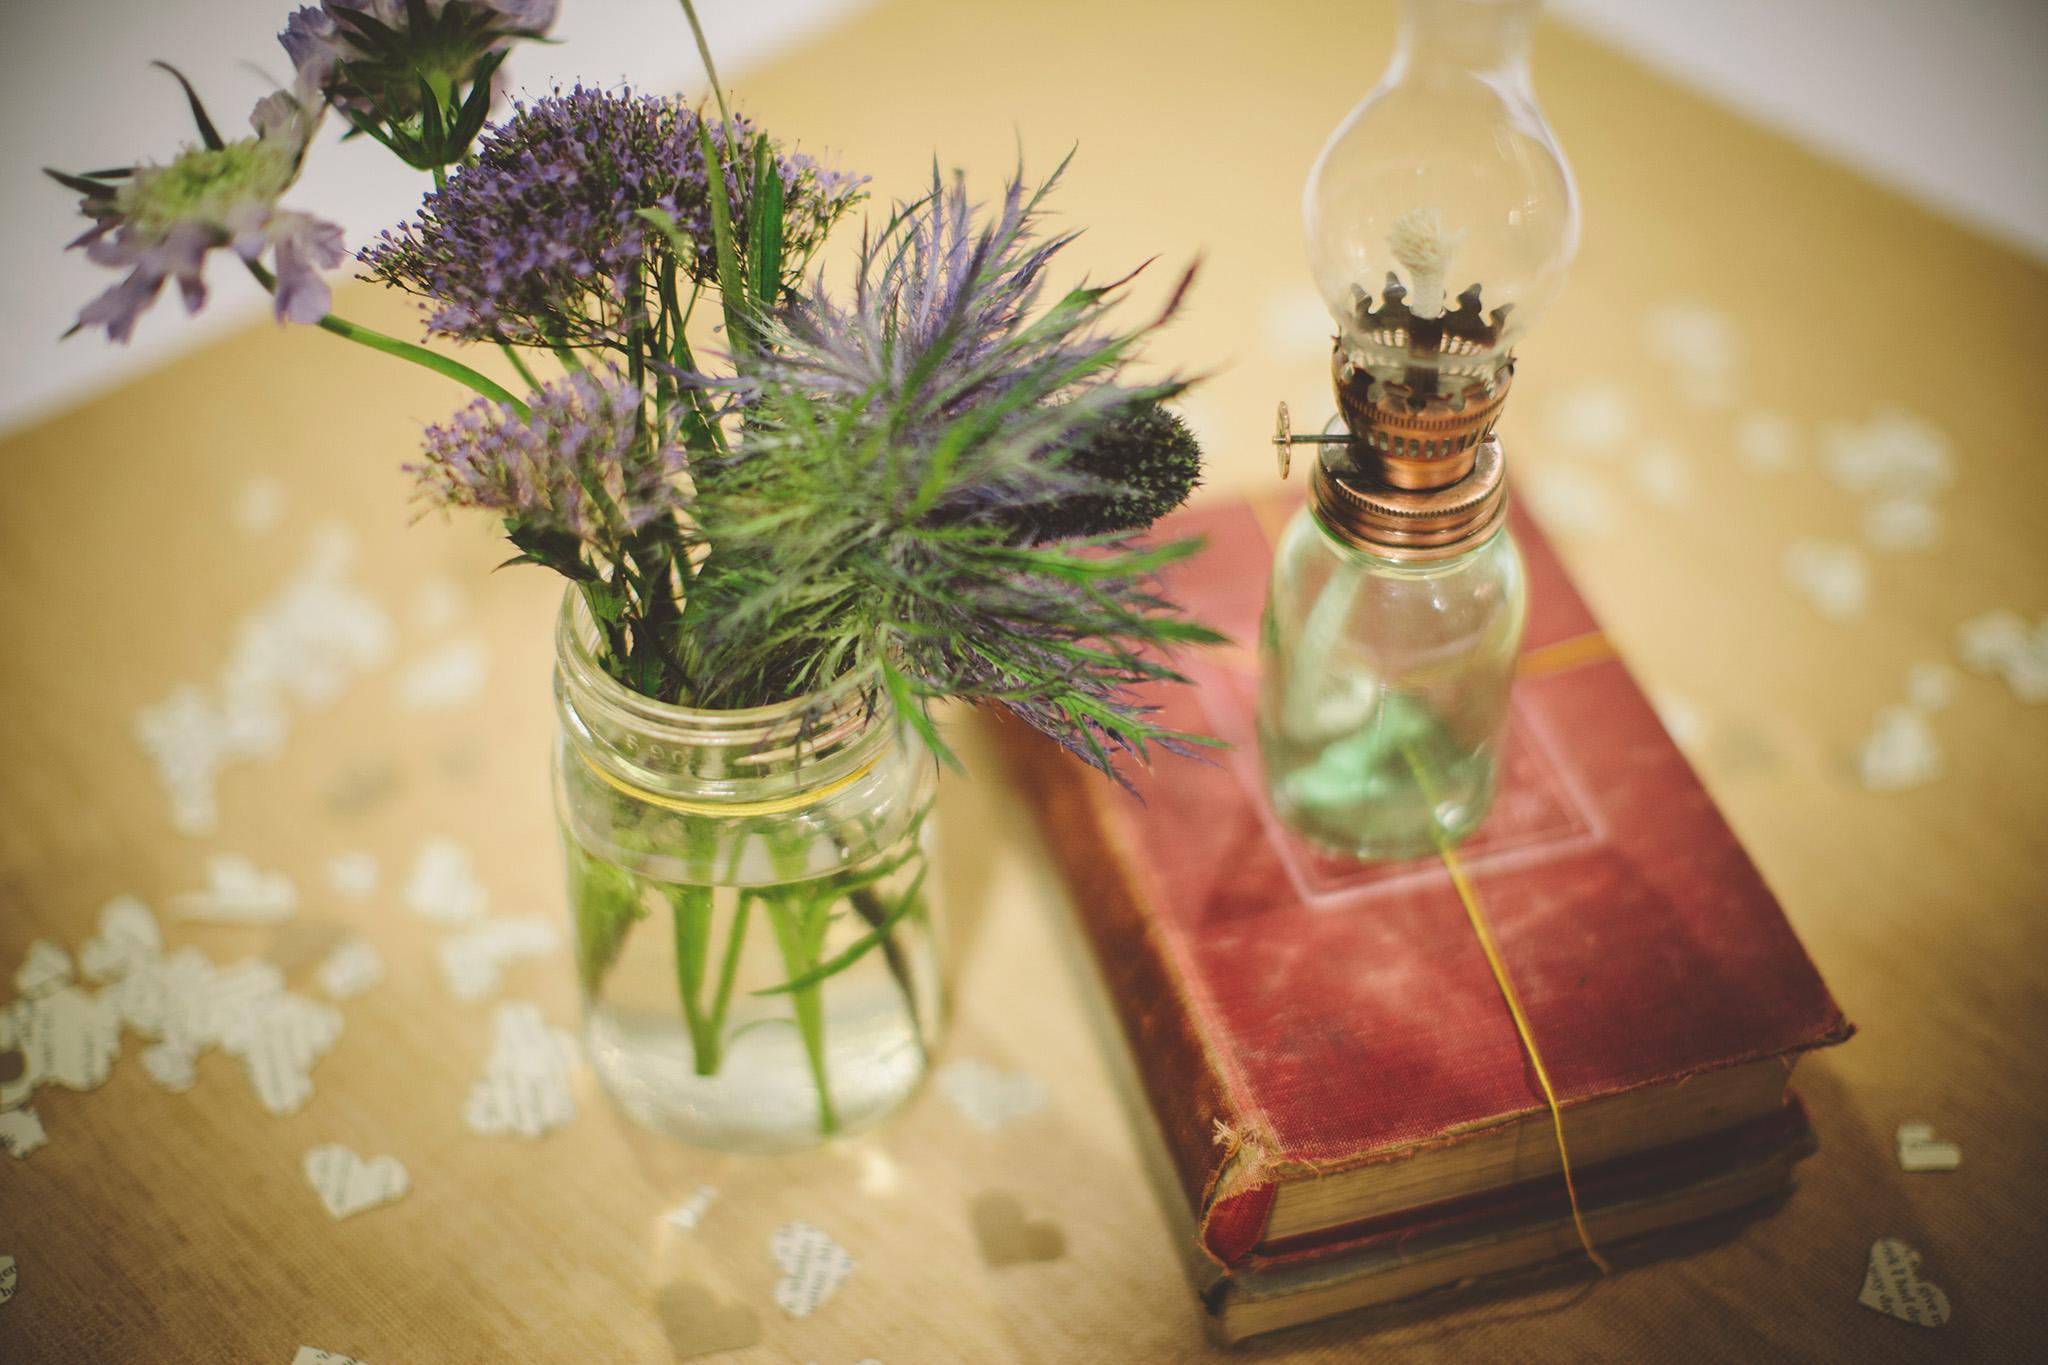 the-bees-knees-floral-design-studio-brainerd-mn-minnesota-wedding-florist-bride-sharayah-wildflower-wedding-centerpiece-table-decor-the-shalom-imaginative